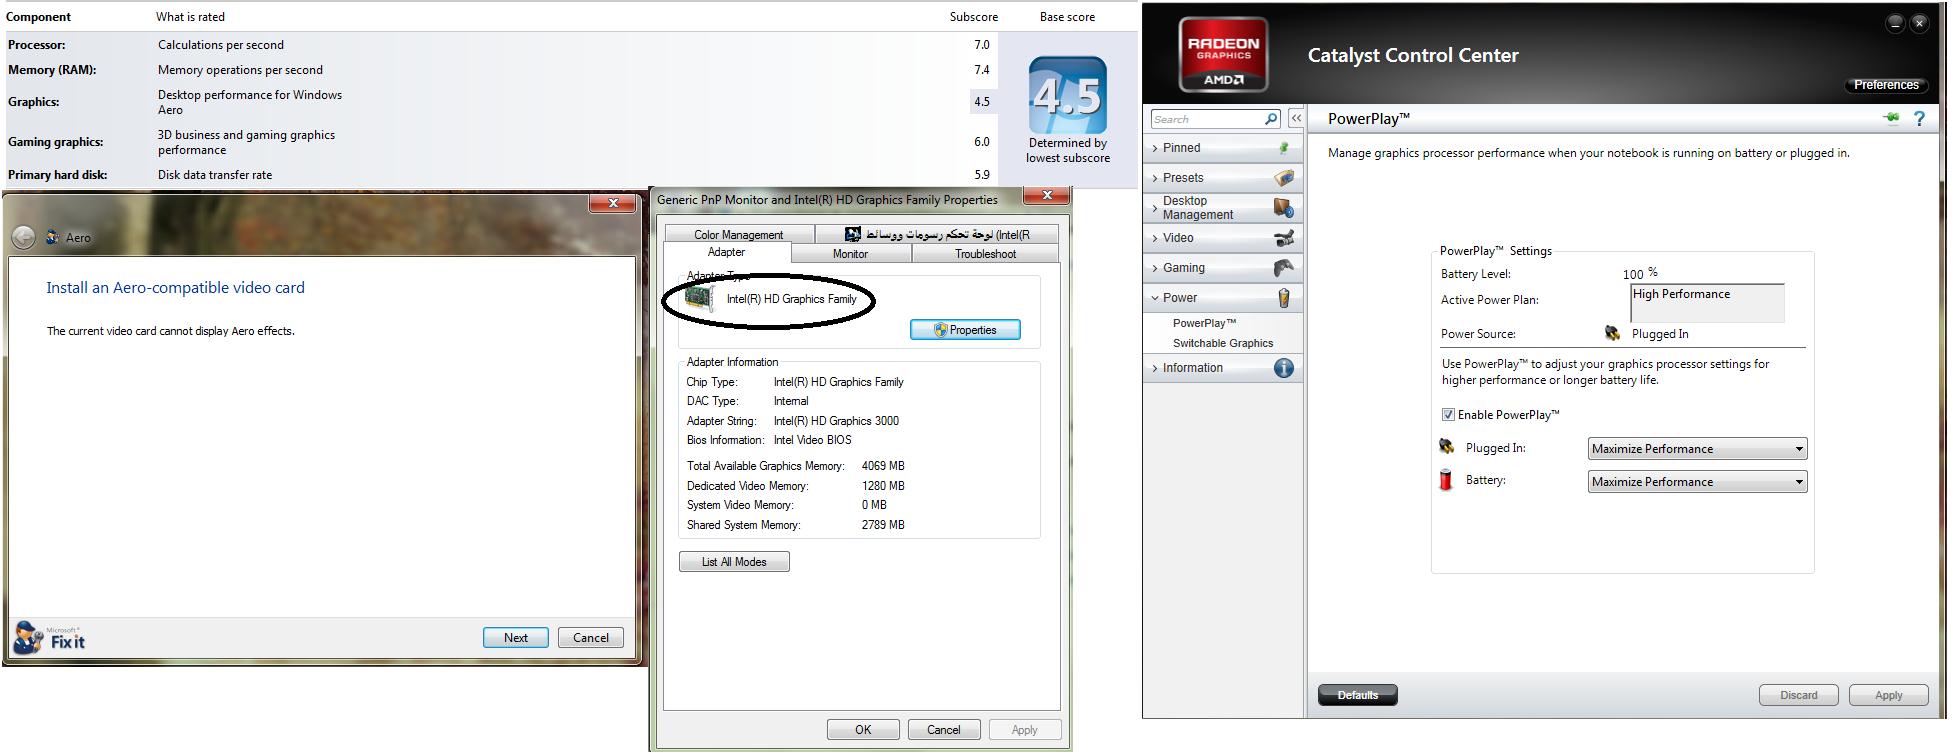 How can i increase desktop performance for windows aero.